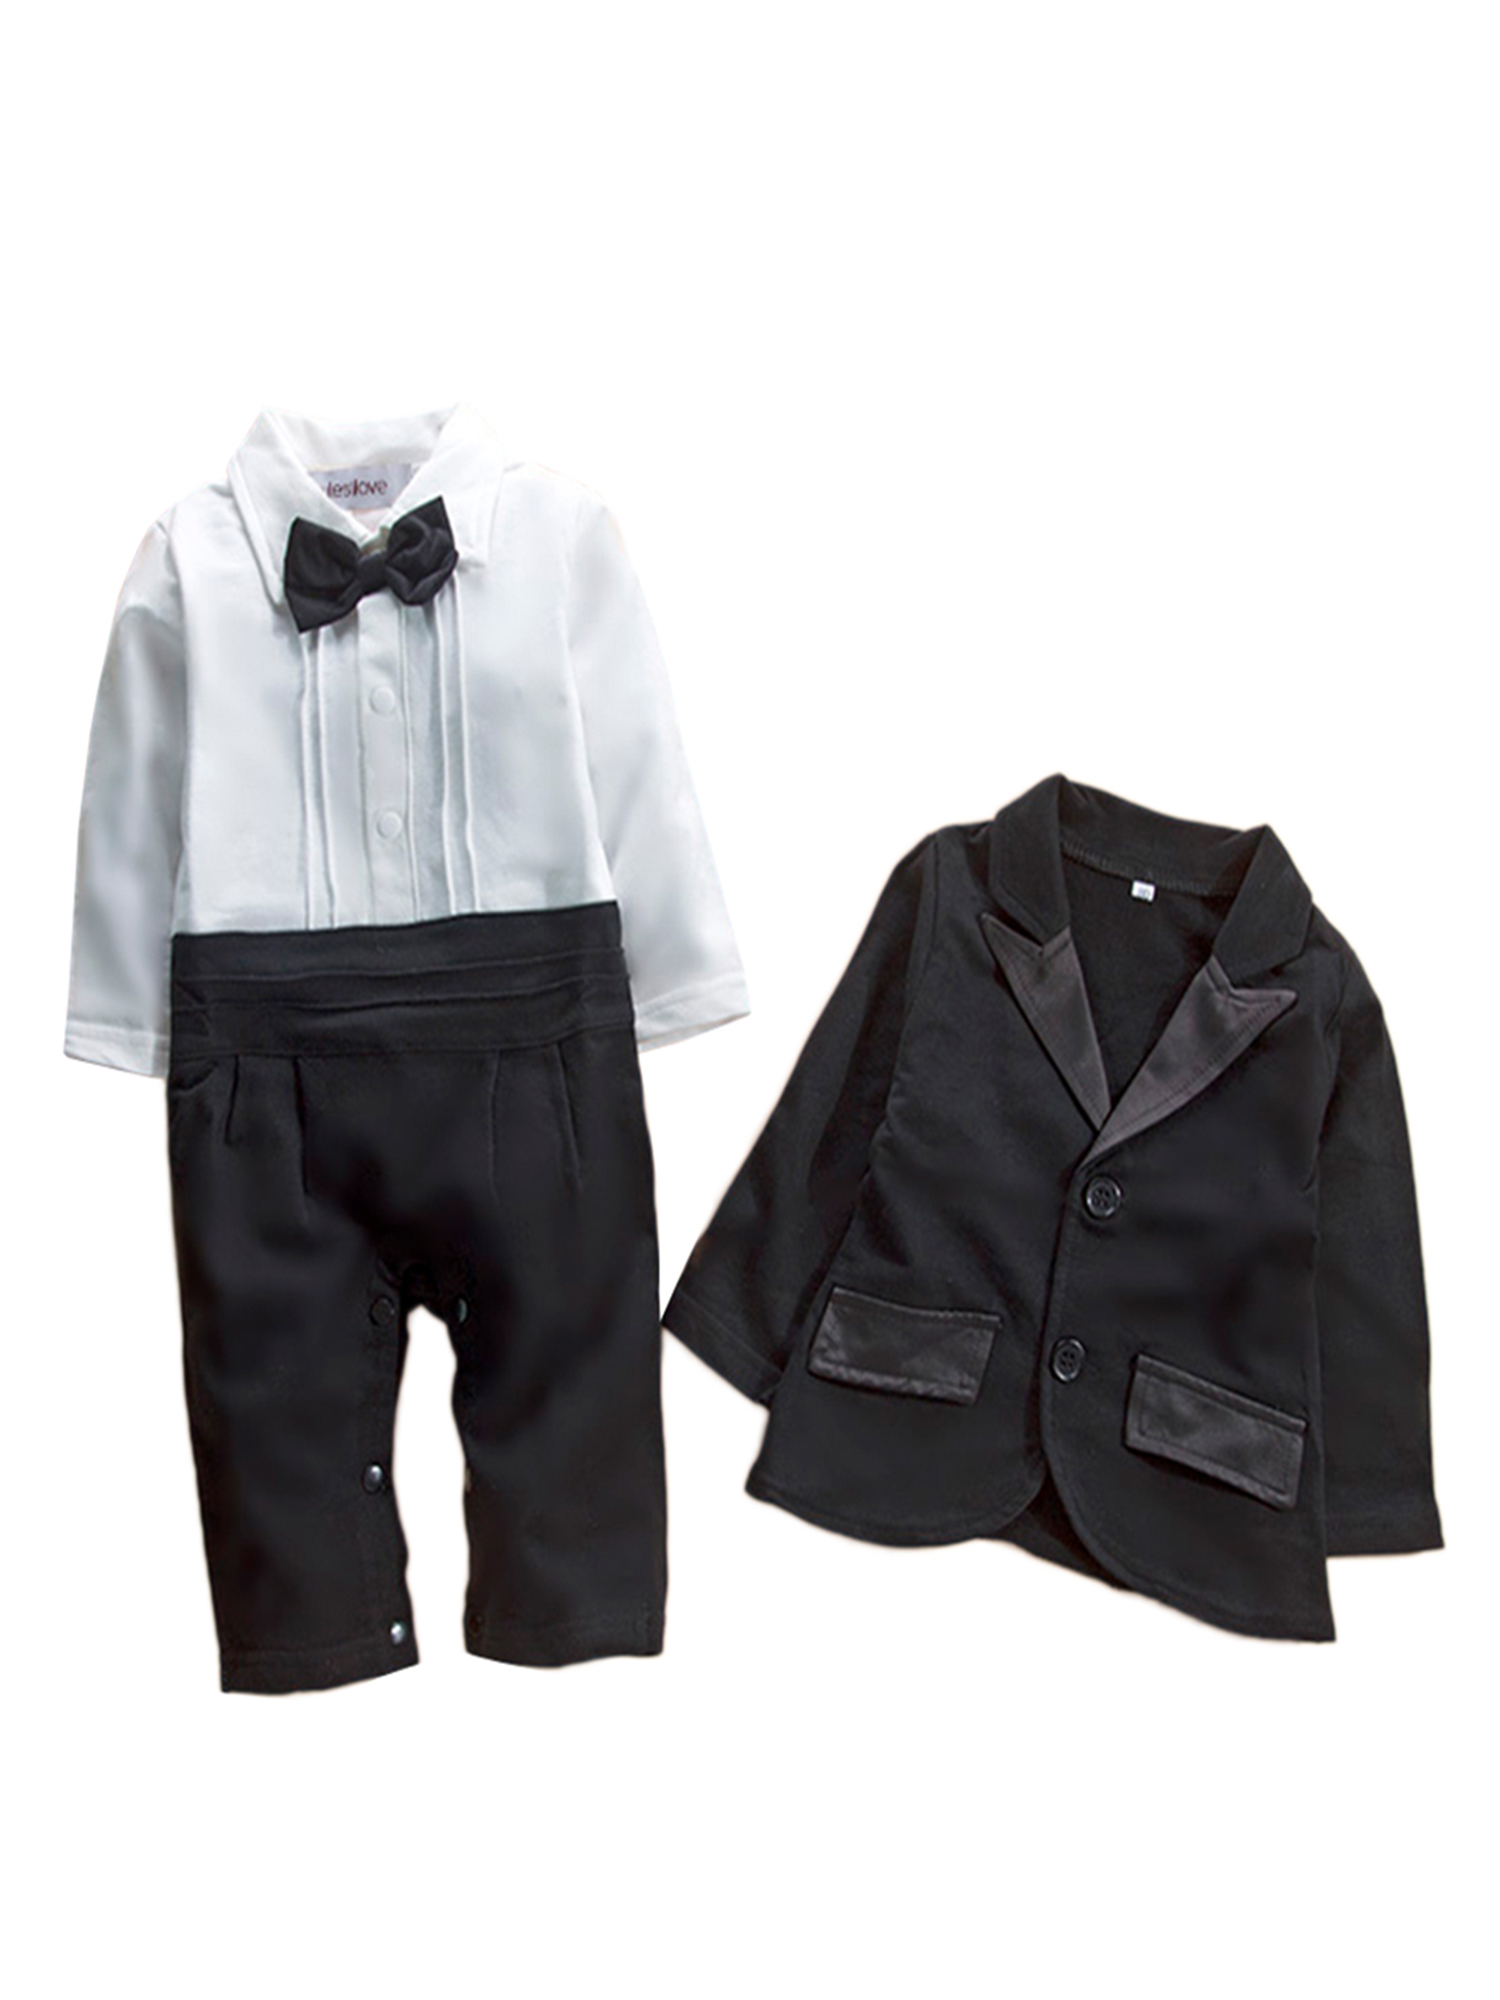 6 mo New Gray//Black - Size 3 Baby Boys Nike Sportswear Summer Romper